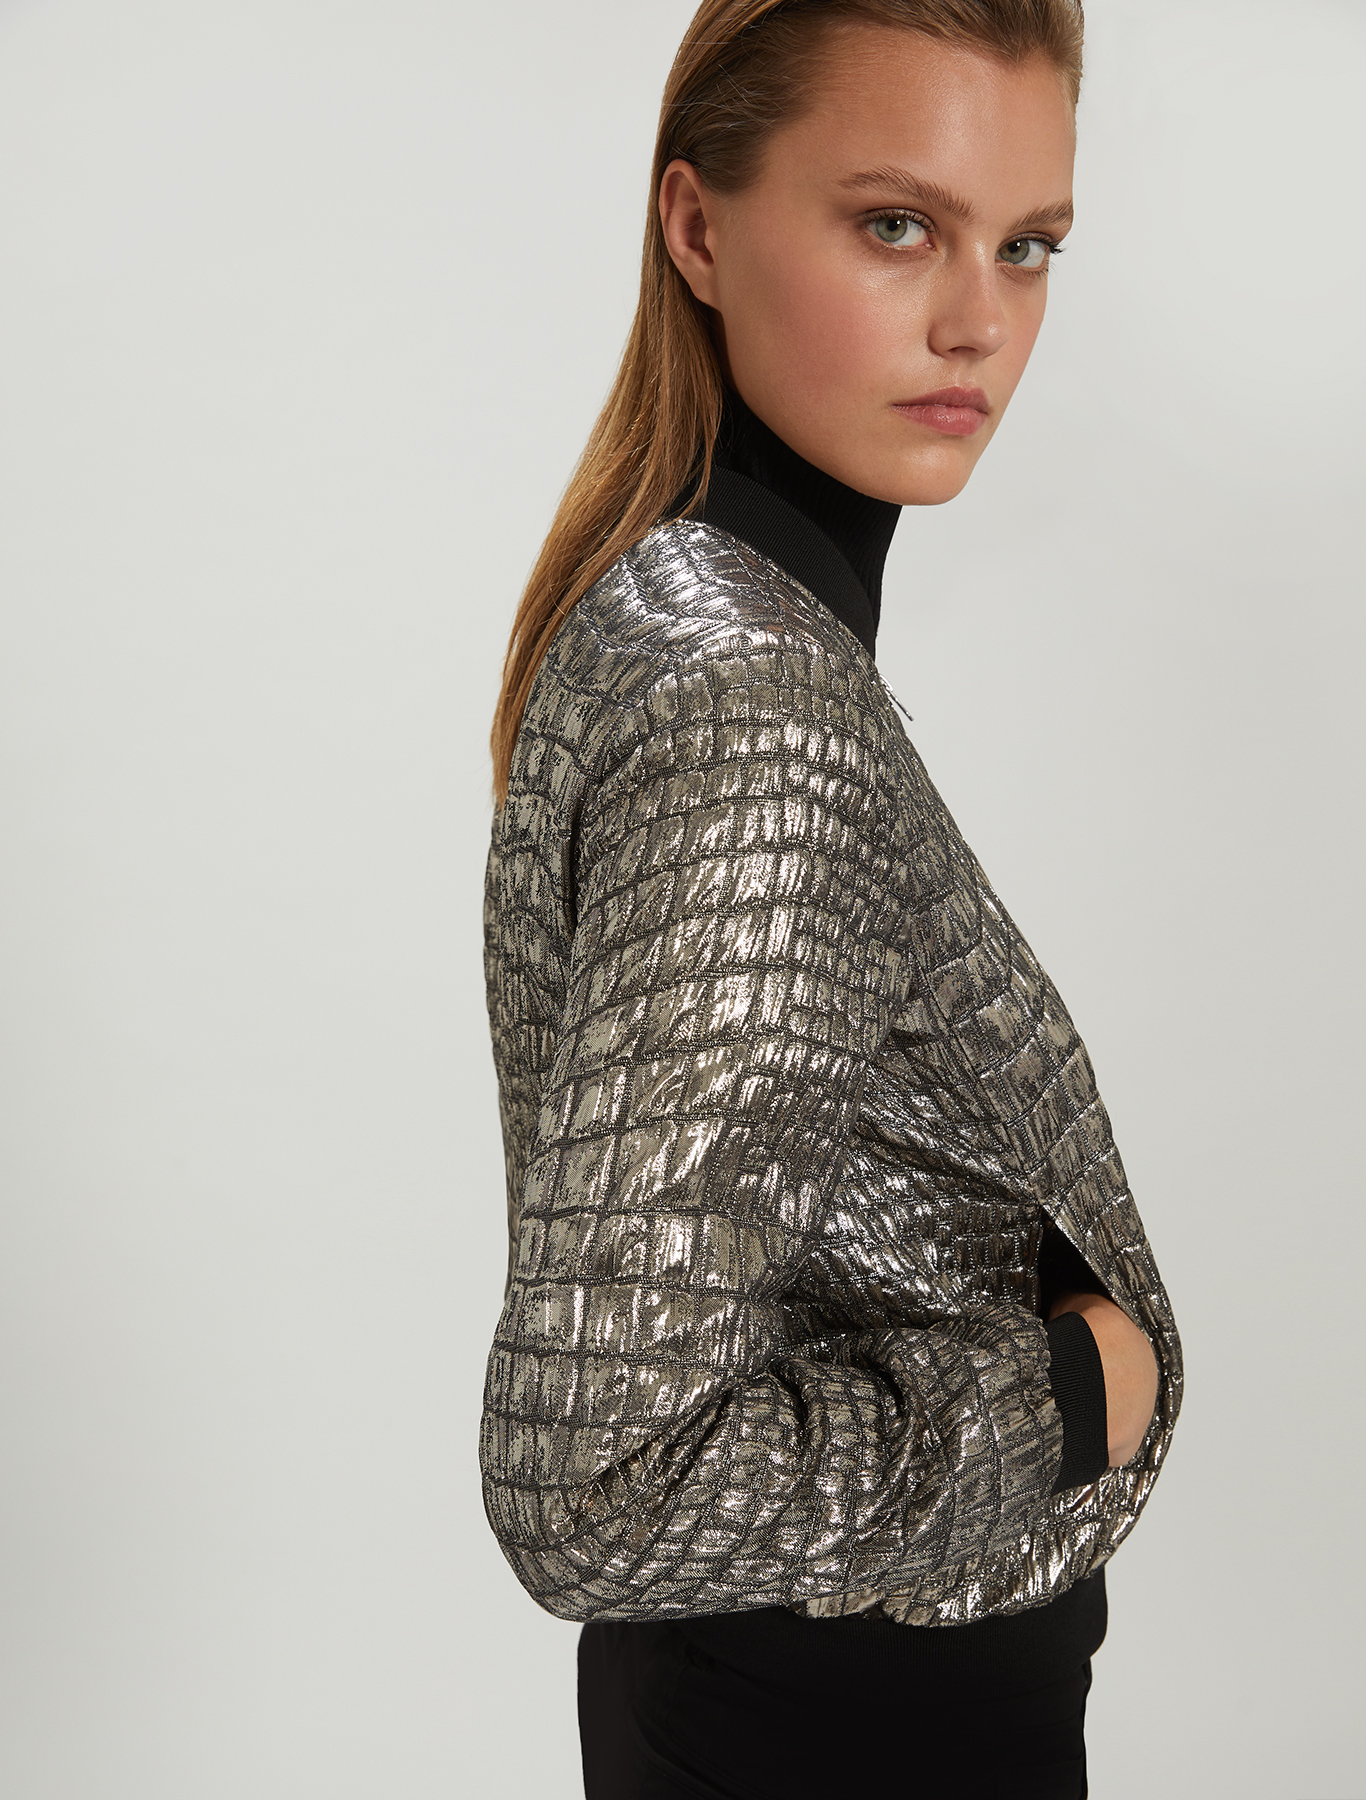 Crocodile lamé bomber jacket - silver - pennyblack